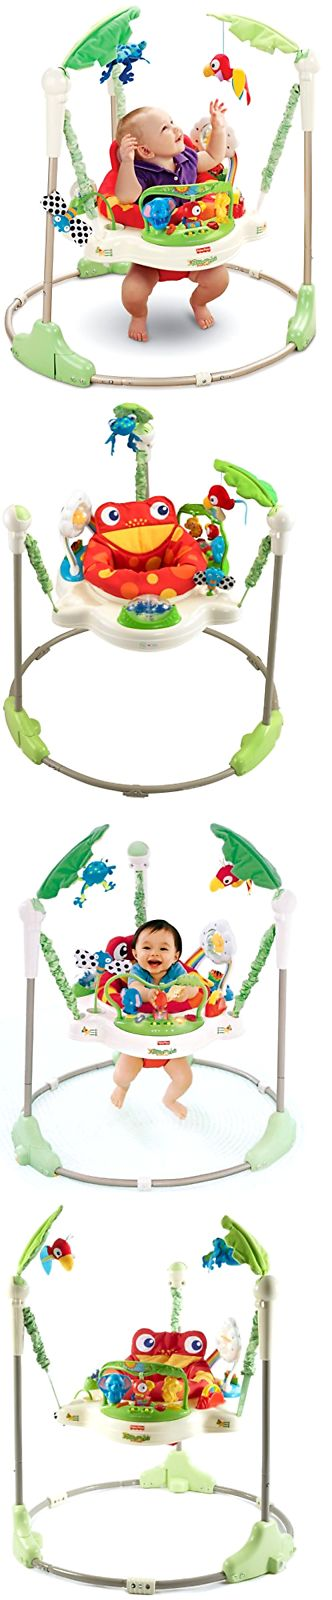 cbe5a682ea18 sleek 5a00a 6cda2 fisher price jumperoo rainforest baby zoo jumper ...